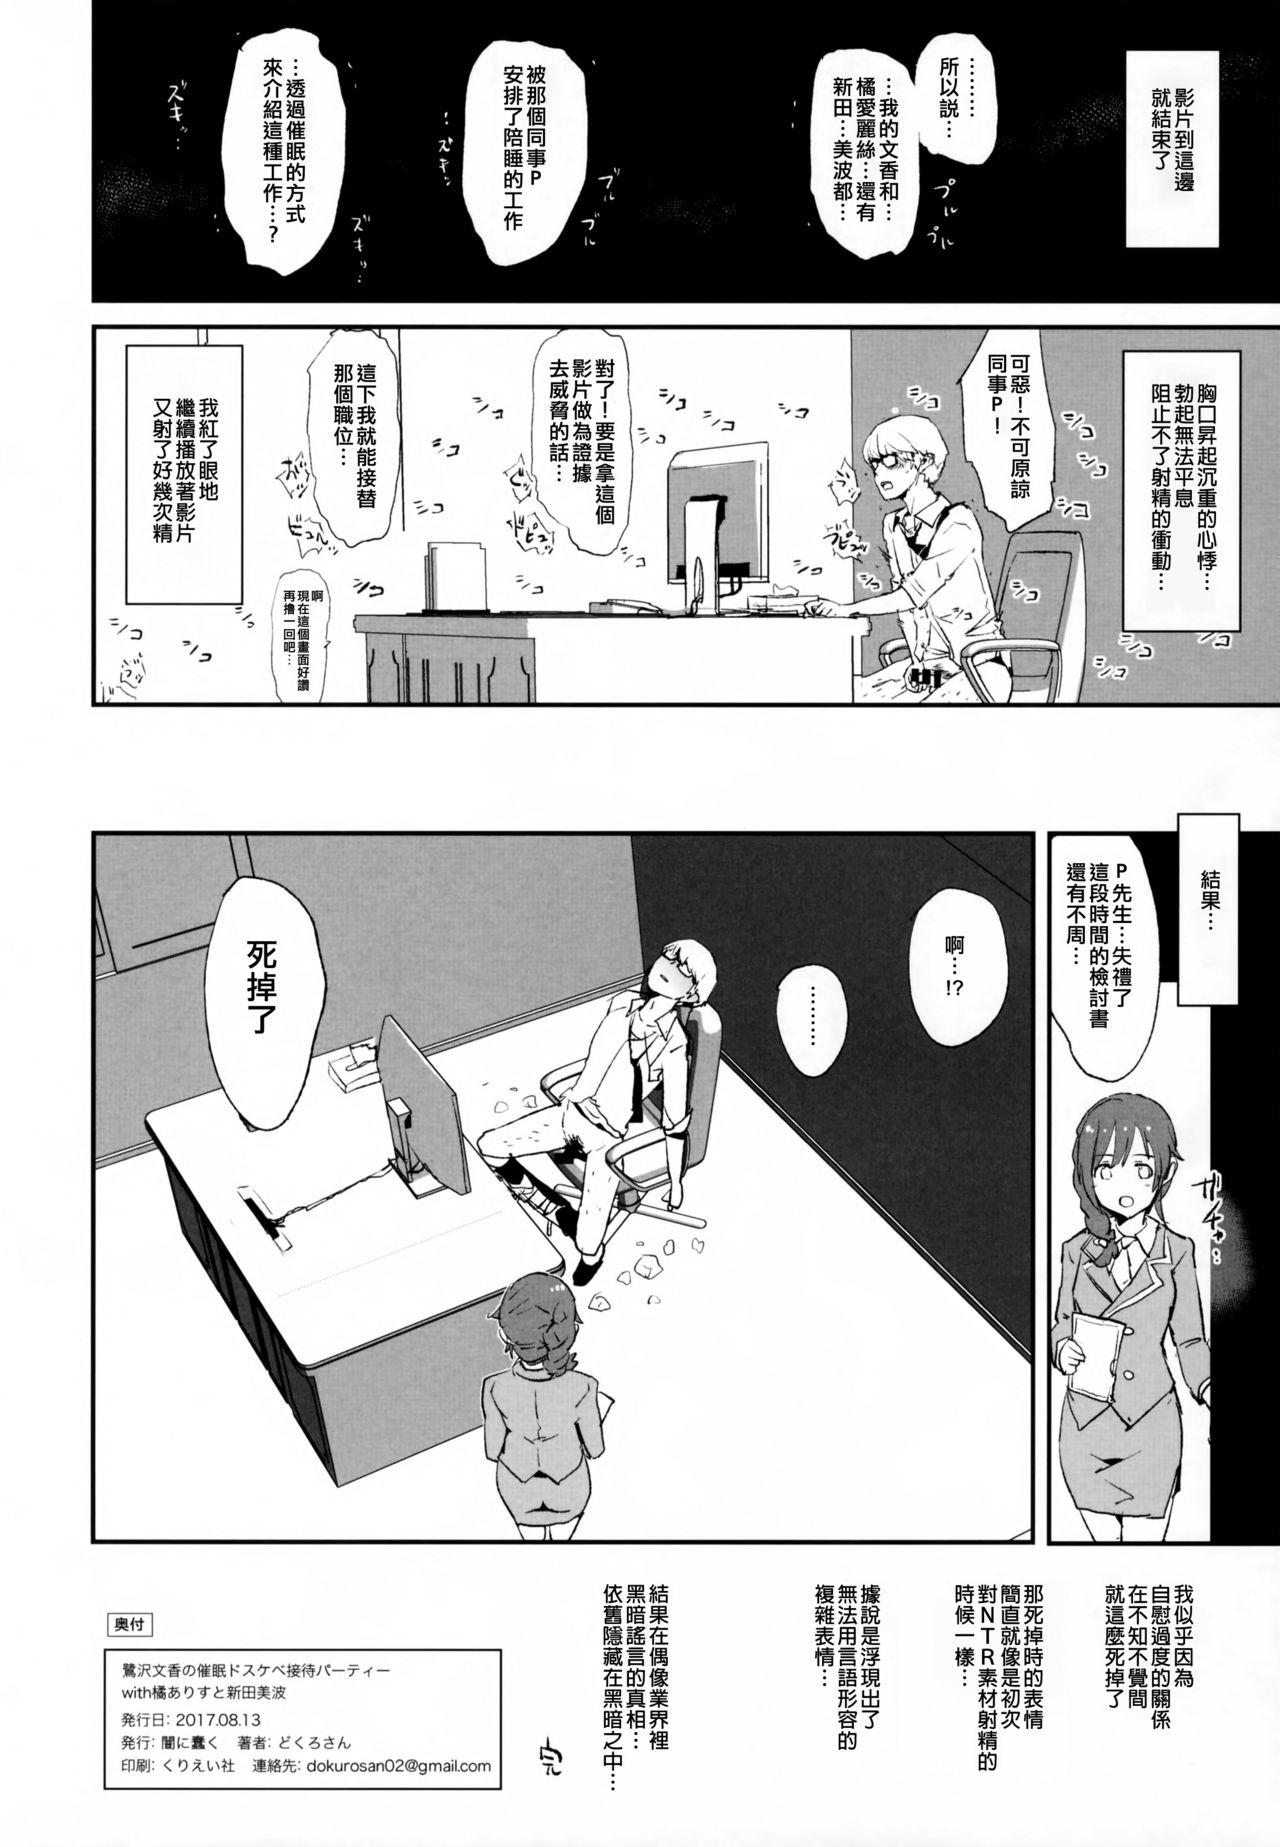 Sagisawa Fumika no Saimin Dosukebe Settai Party with Tachibana Arisu to Nitta Minami + Omake Paper 23